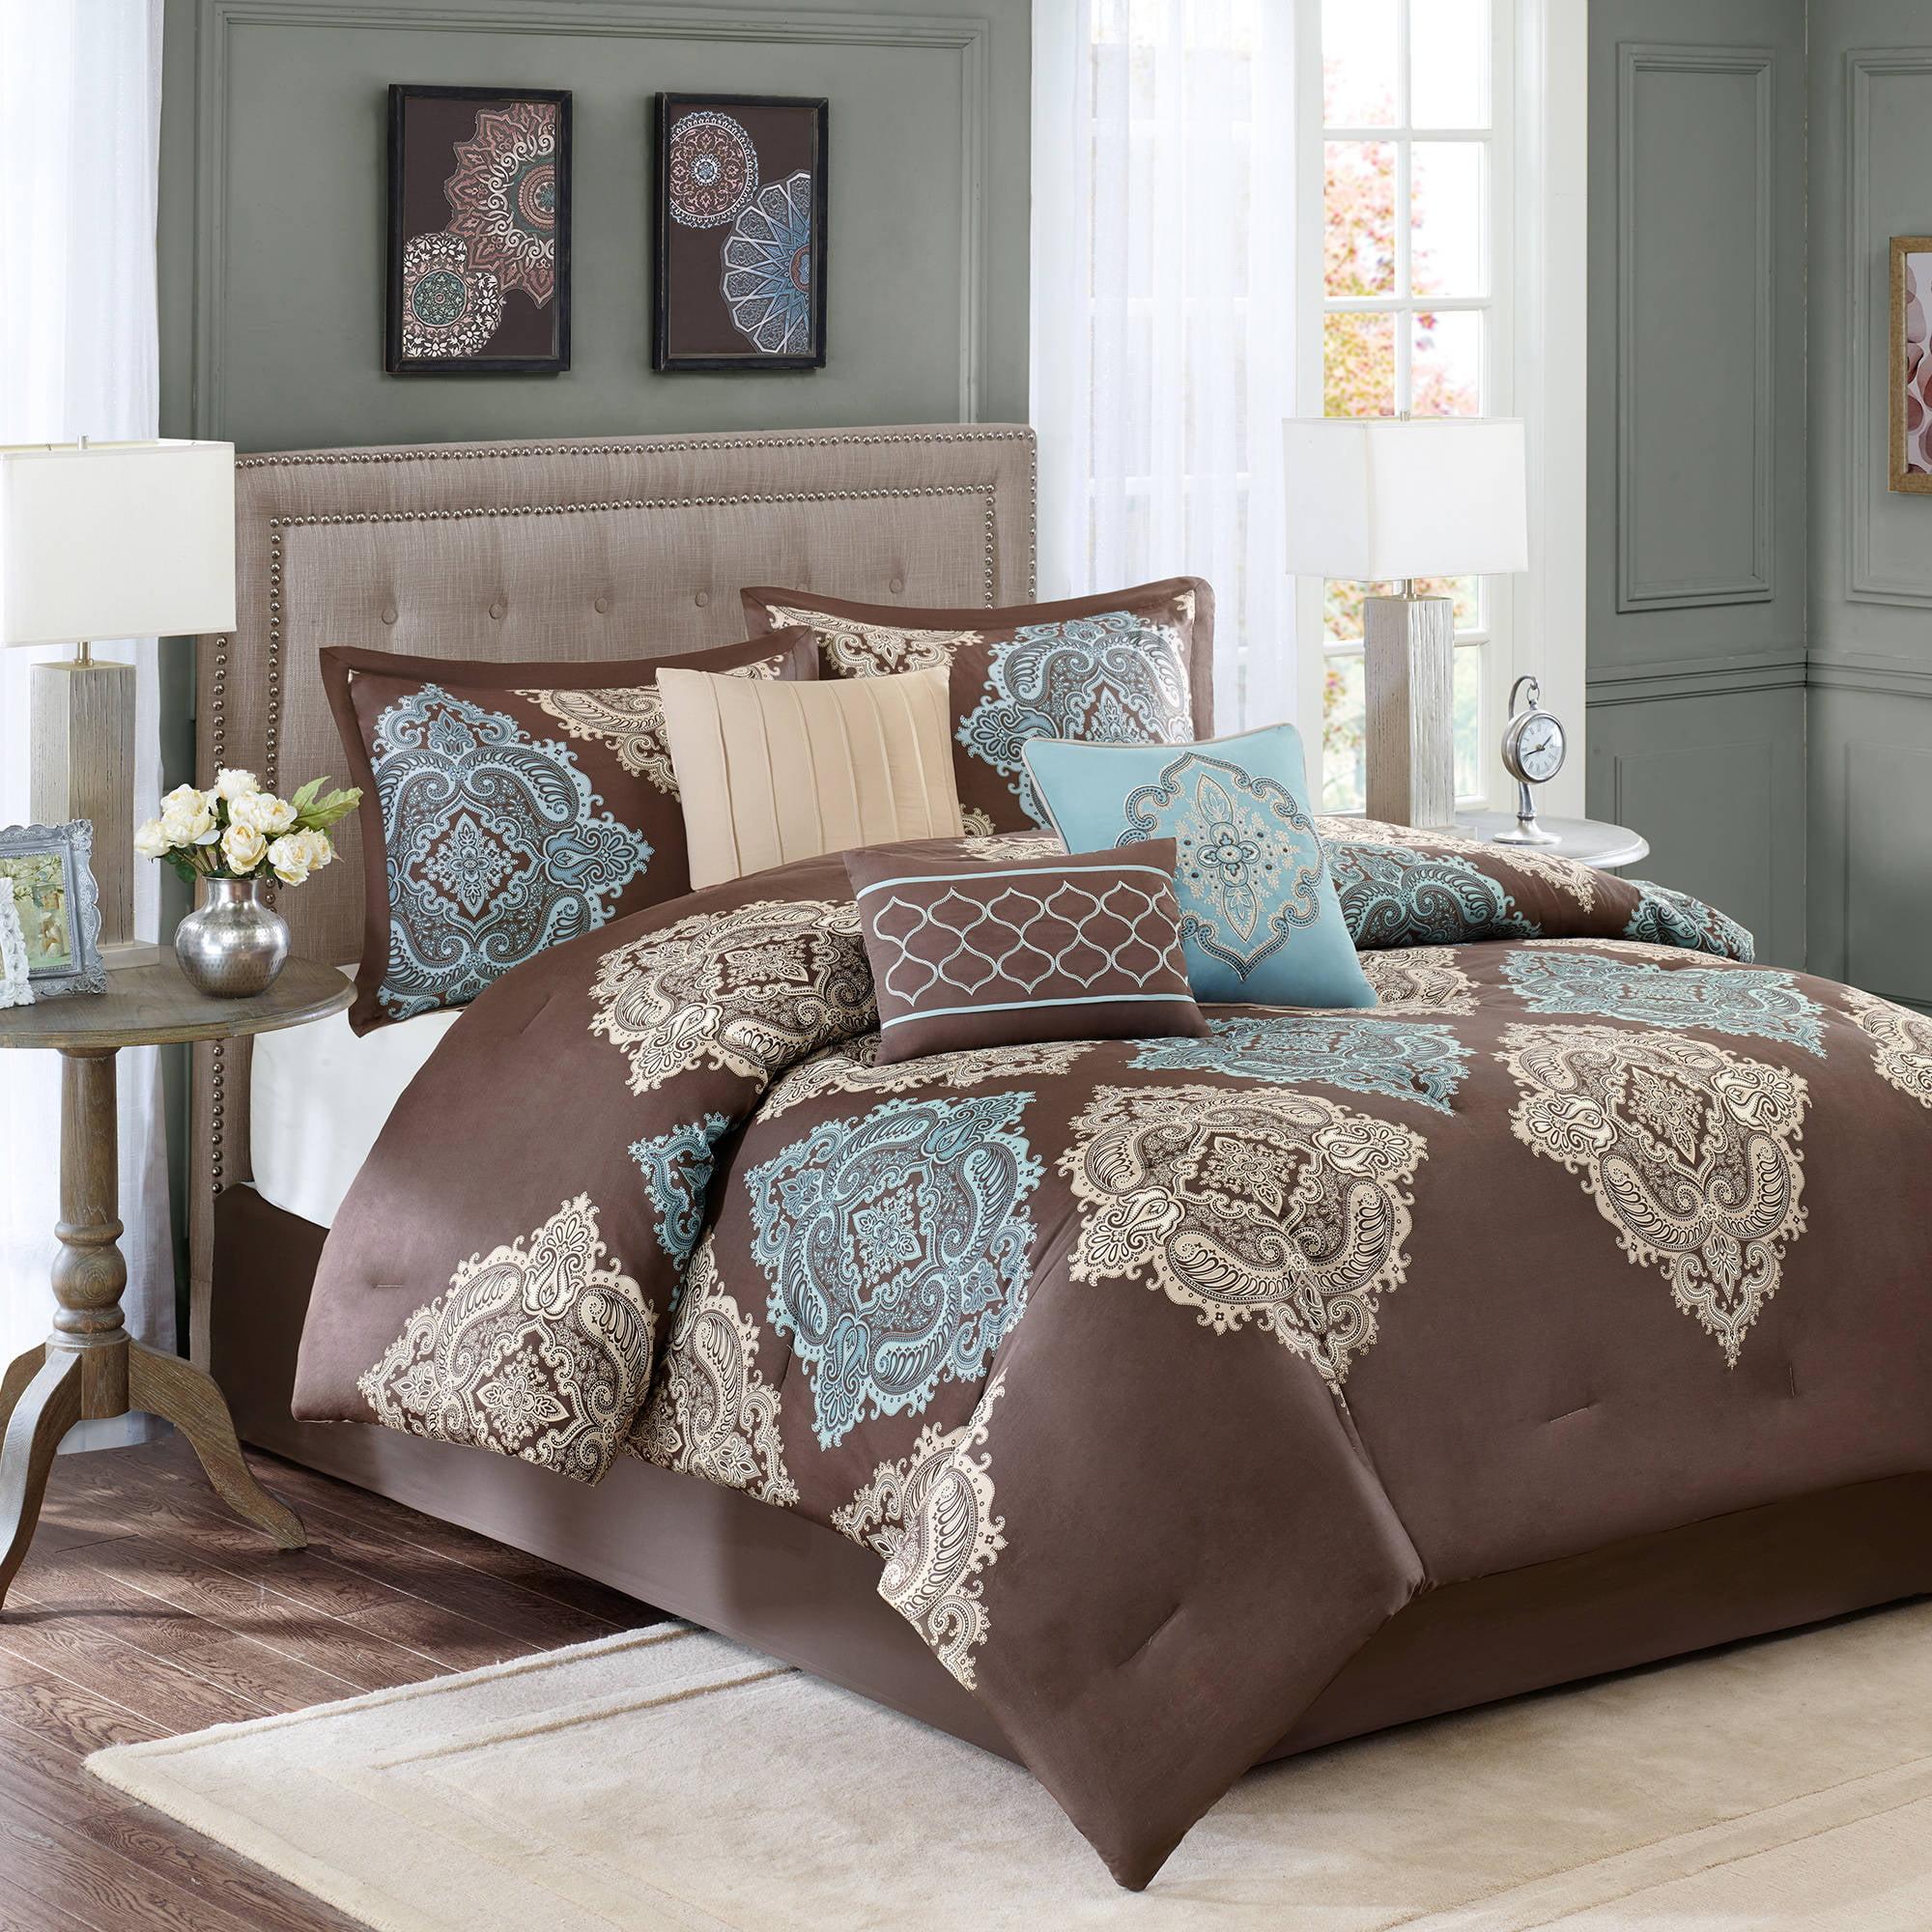 sets york comforter p bedding queen set stripe khaki new newport warm multi j by